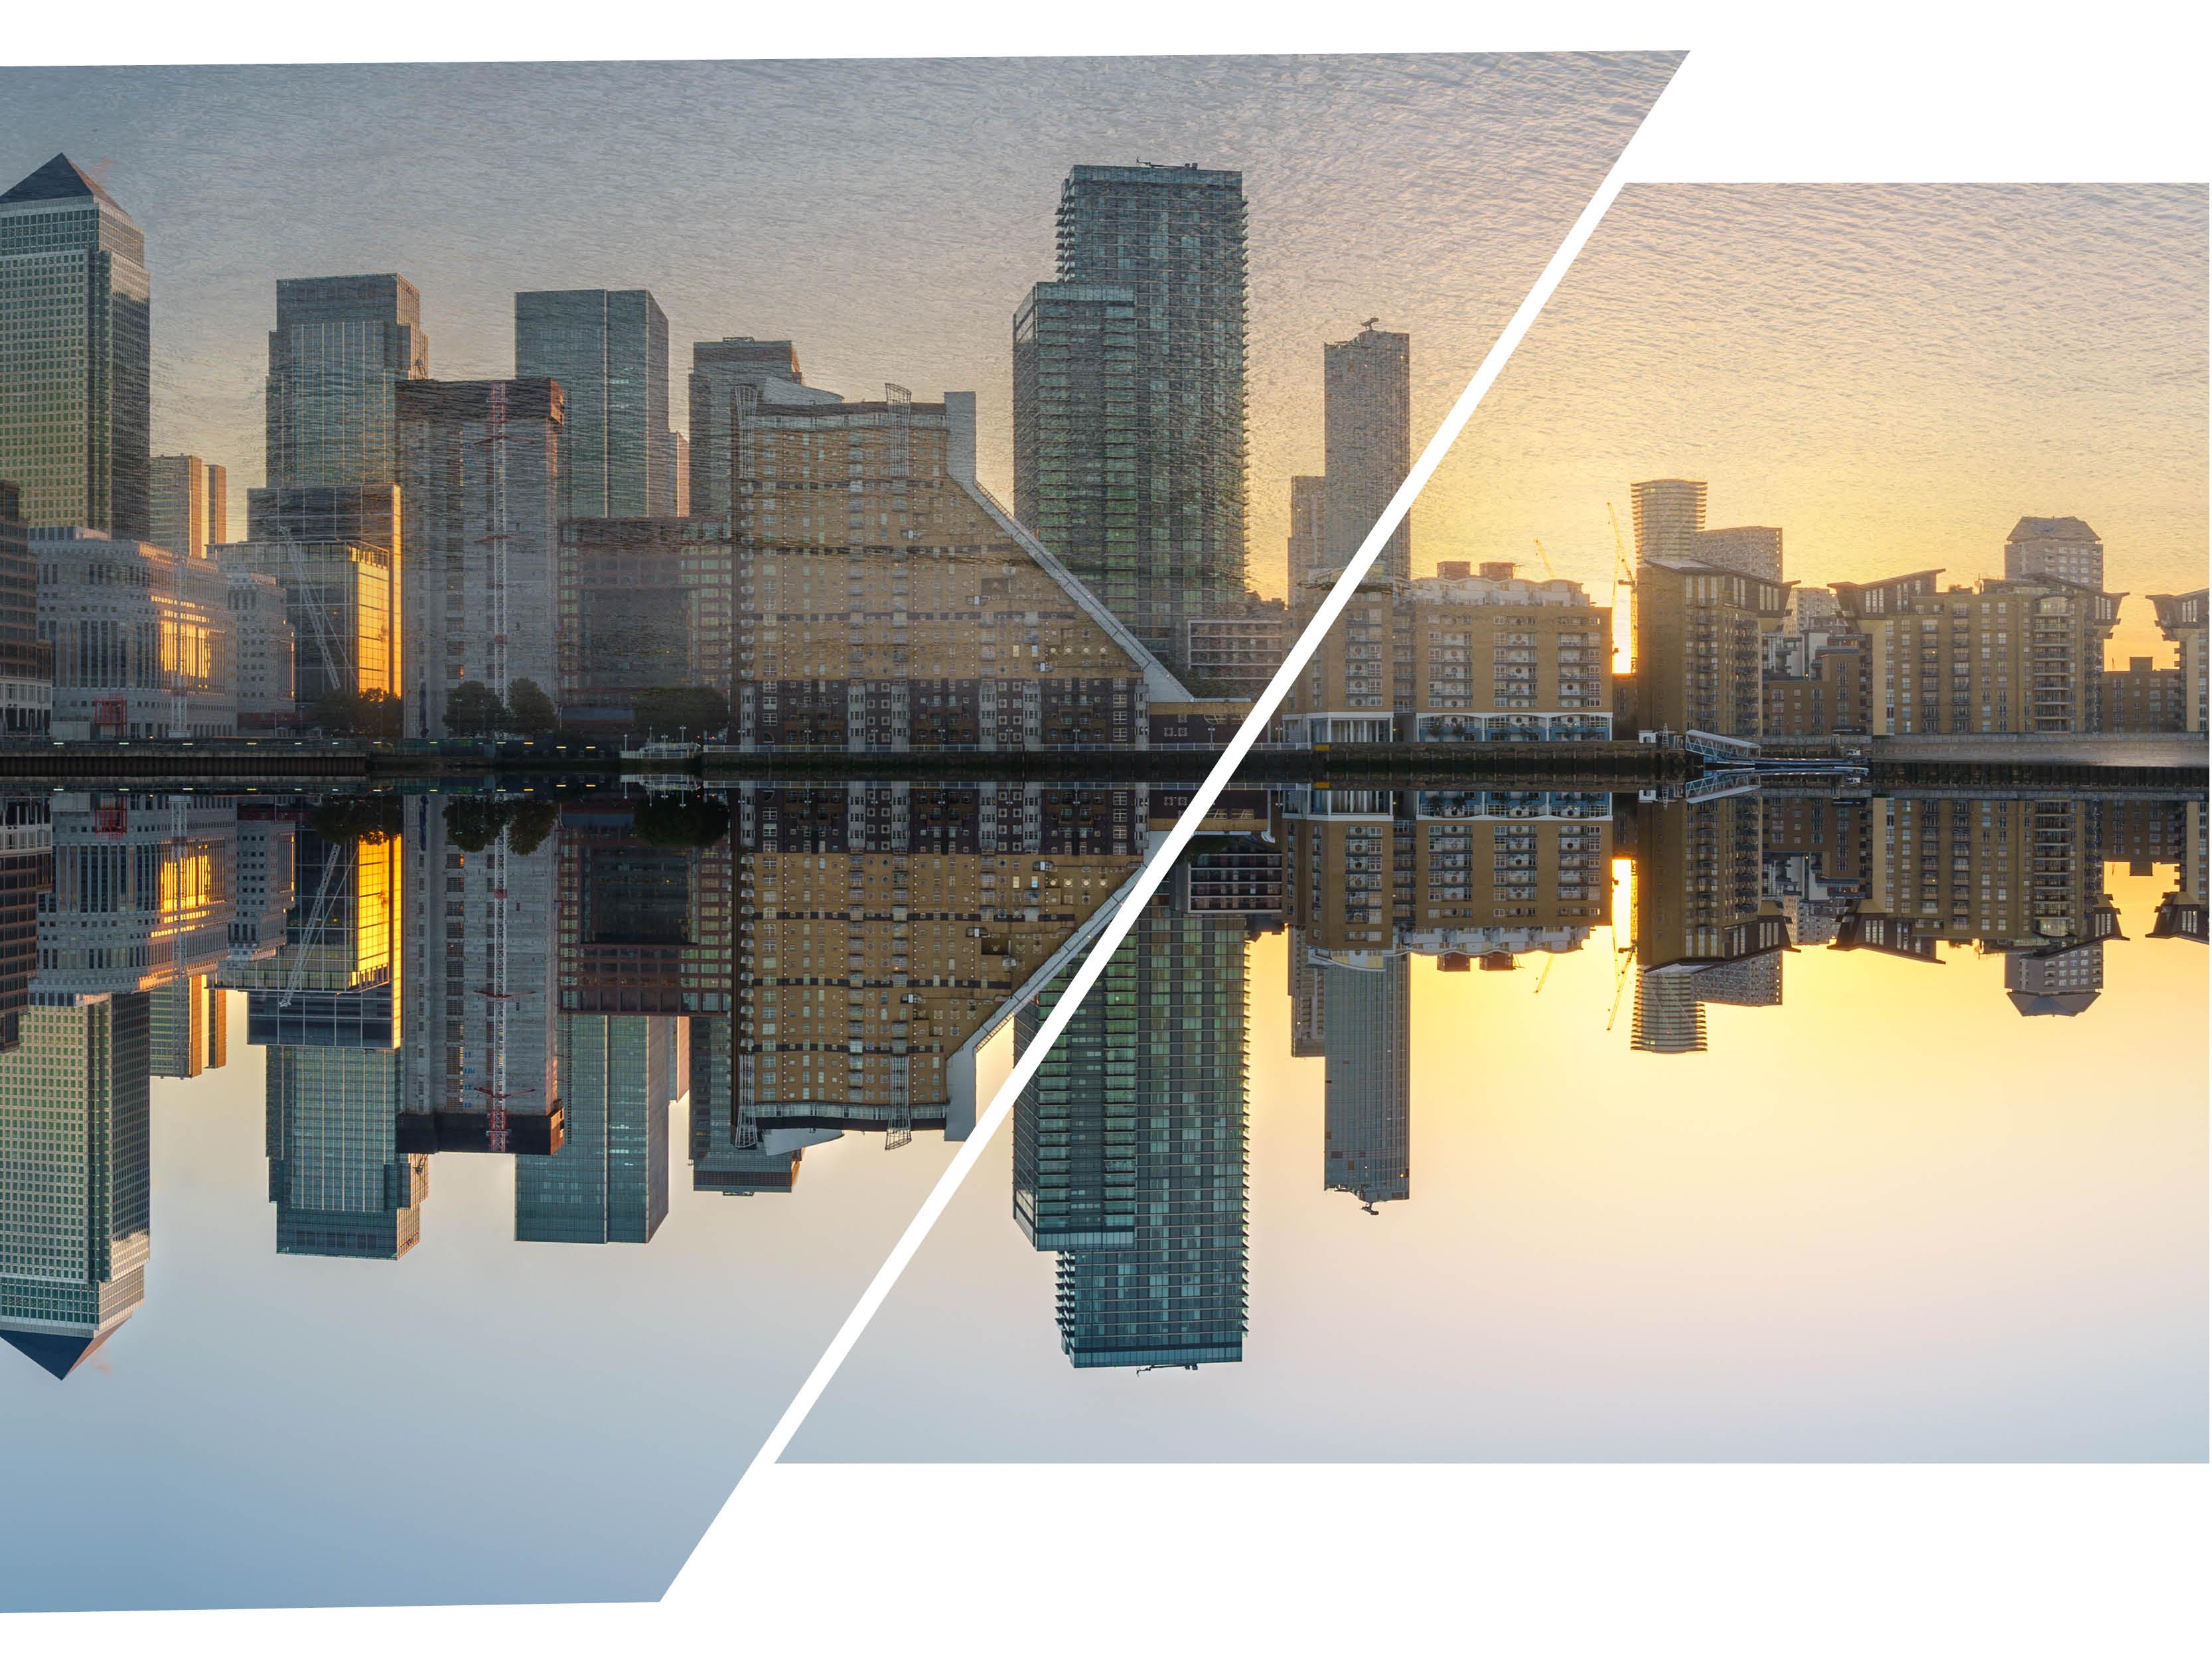 The Docklands affect